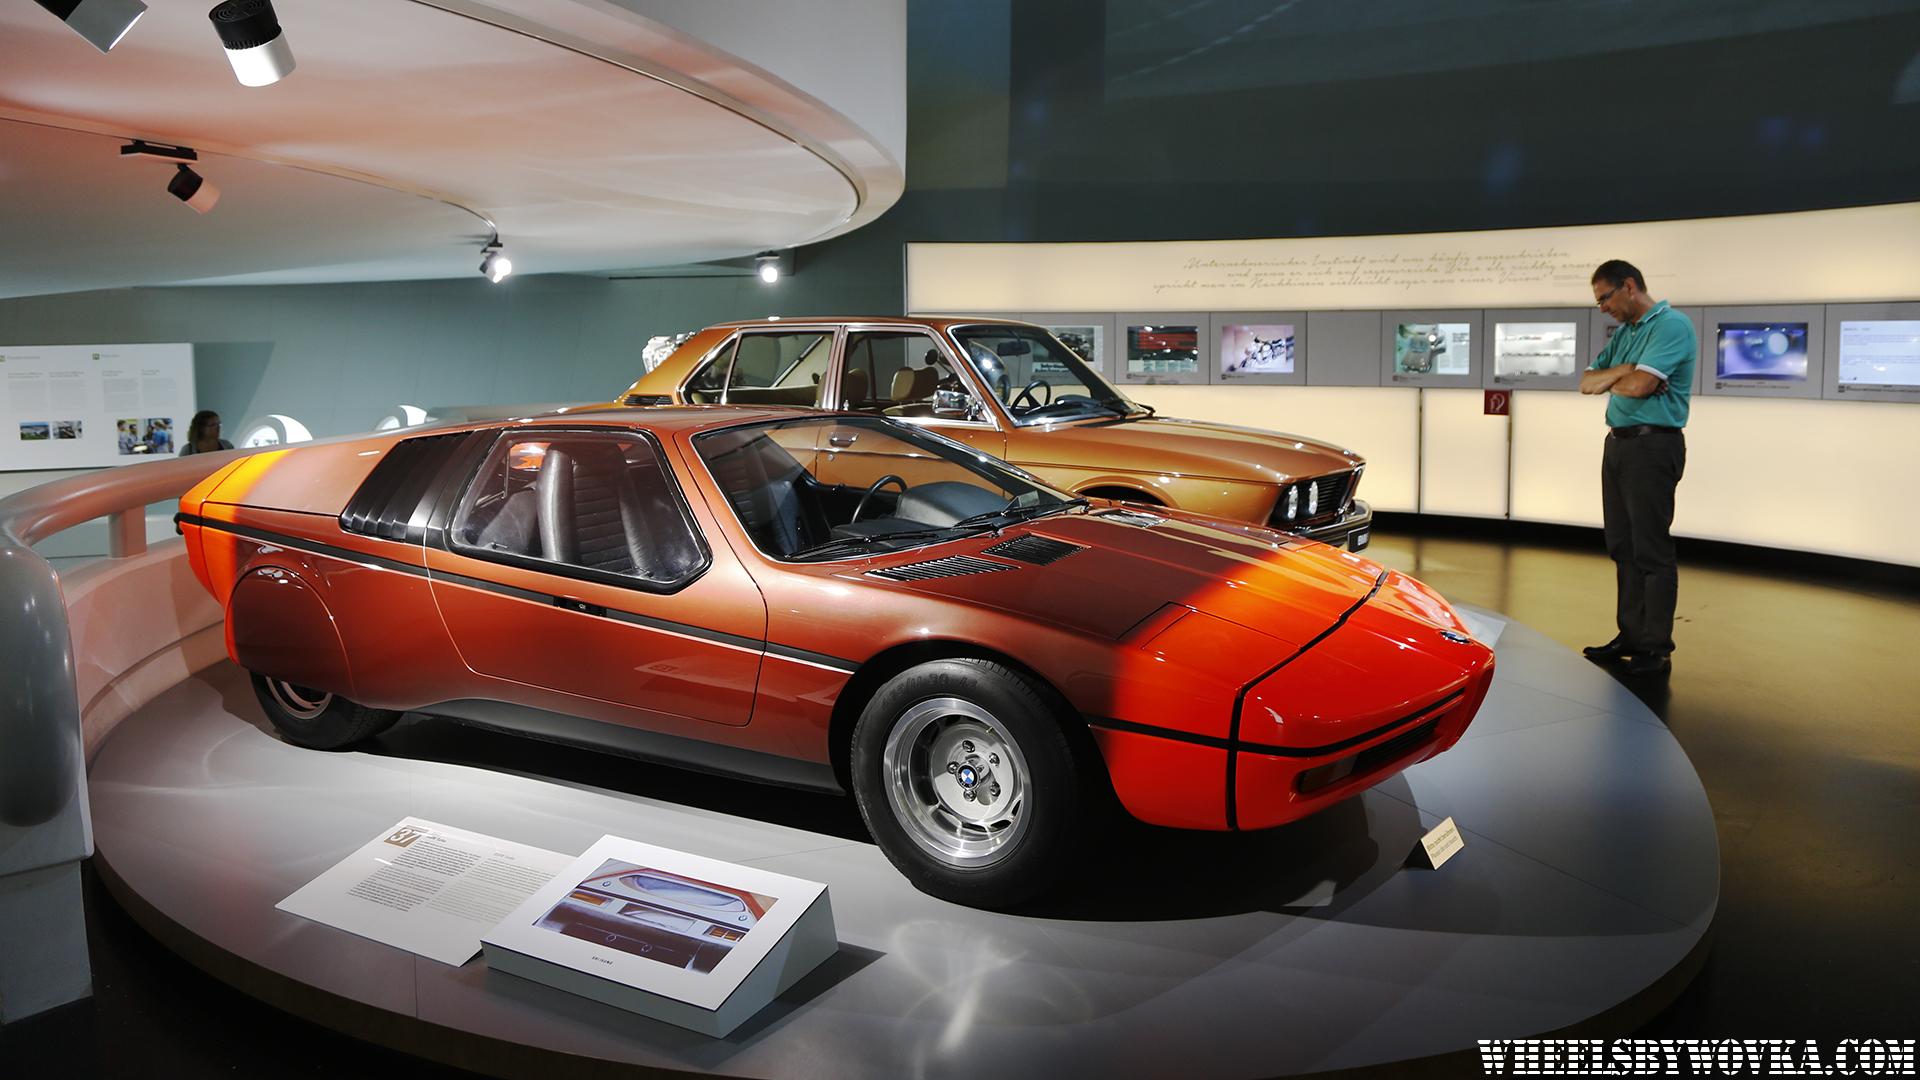 bmw-museum-welt-wheelsbywovka-30